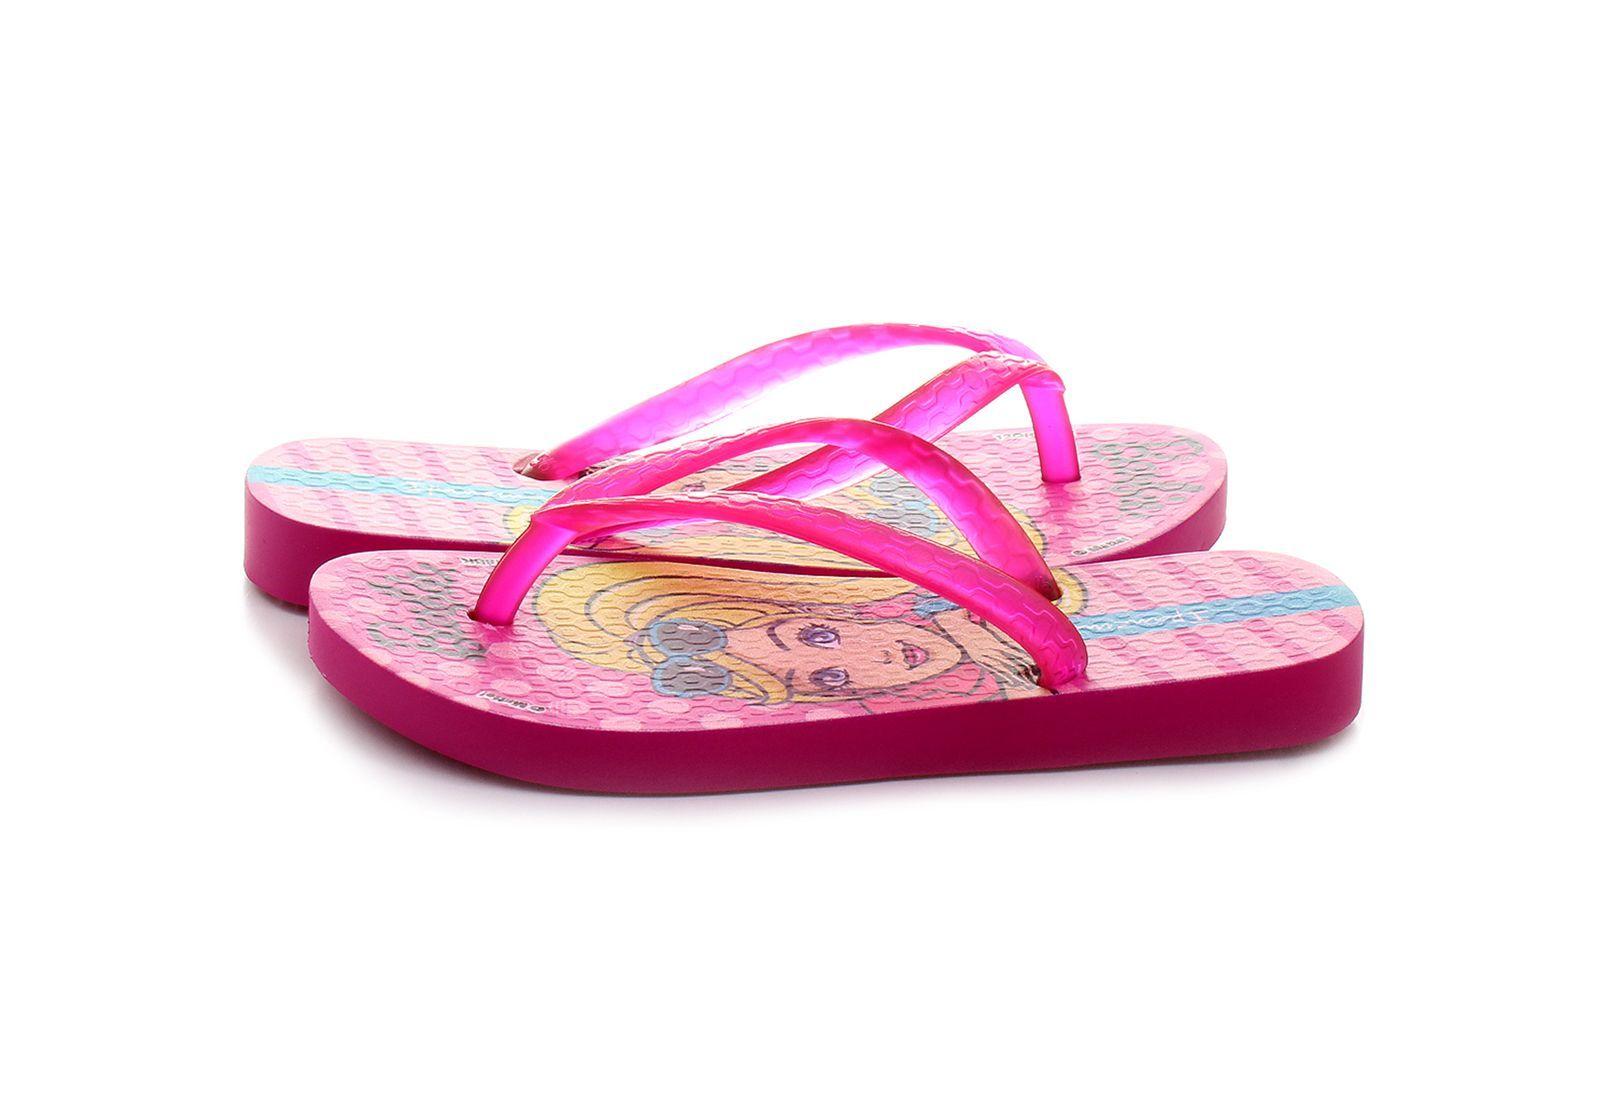 51384f4f08b7 Ipanema Šľapky - Barbie Kids - 35614-20791 - Tenisky